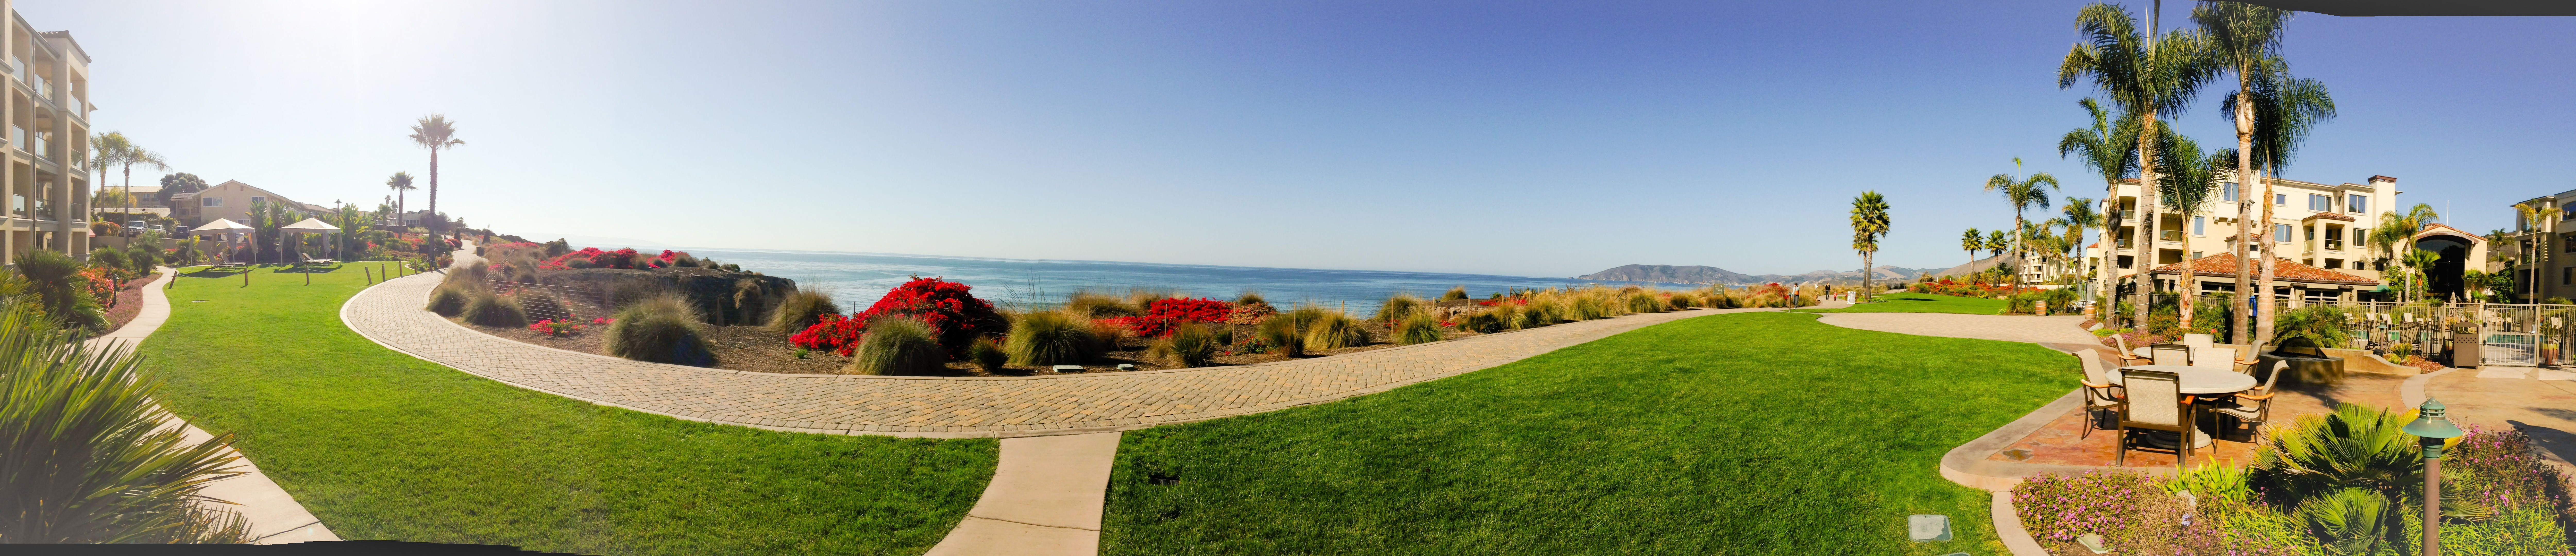 Panoramic view of Dolphin Bay coastline.